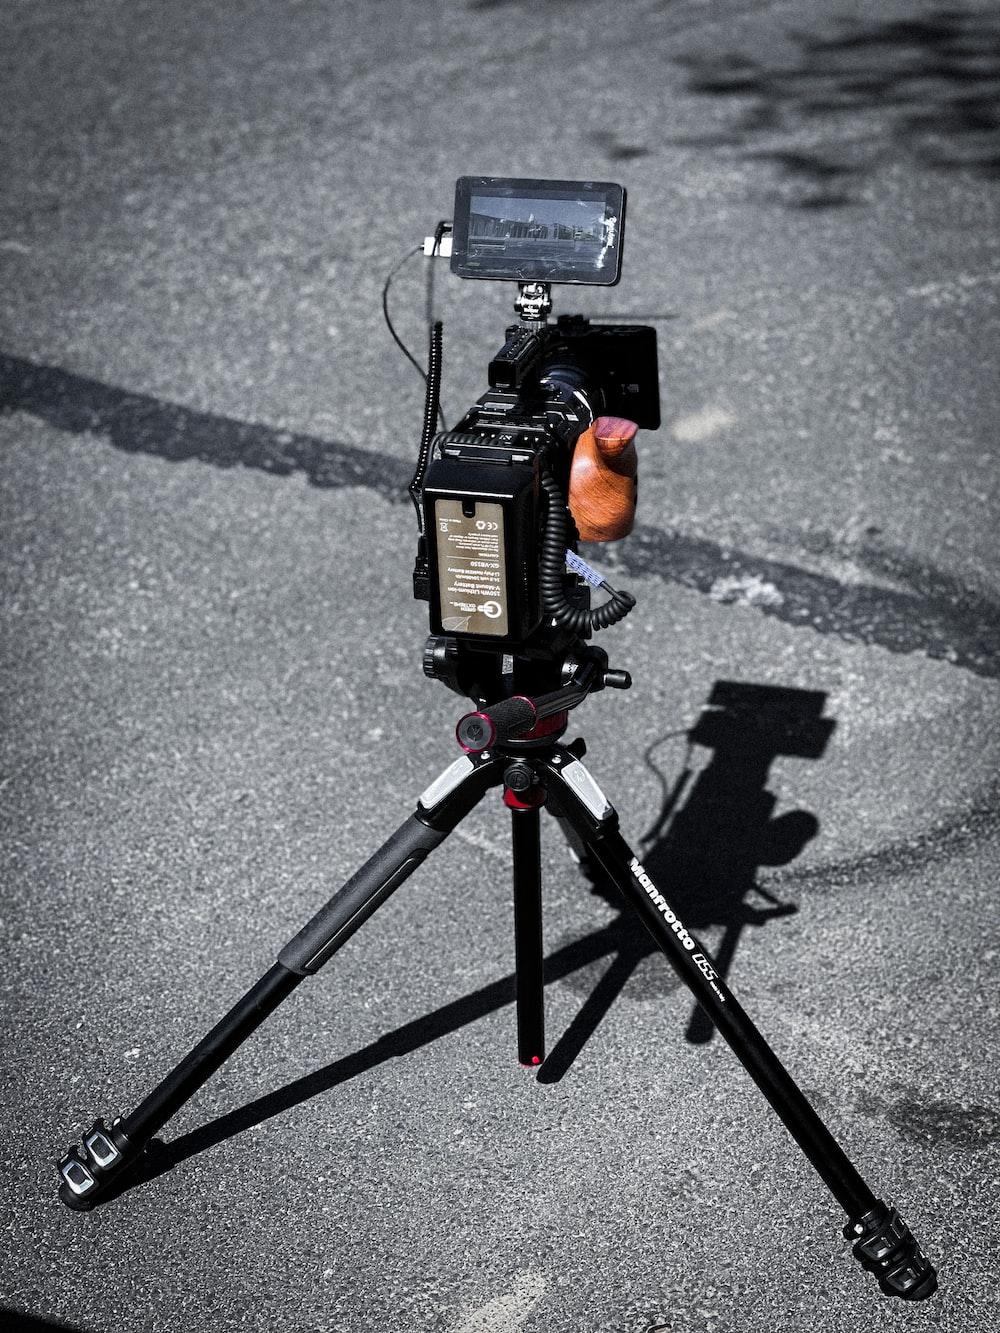 black dslr camera on tripod on road during daytime